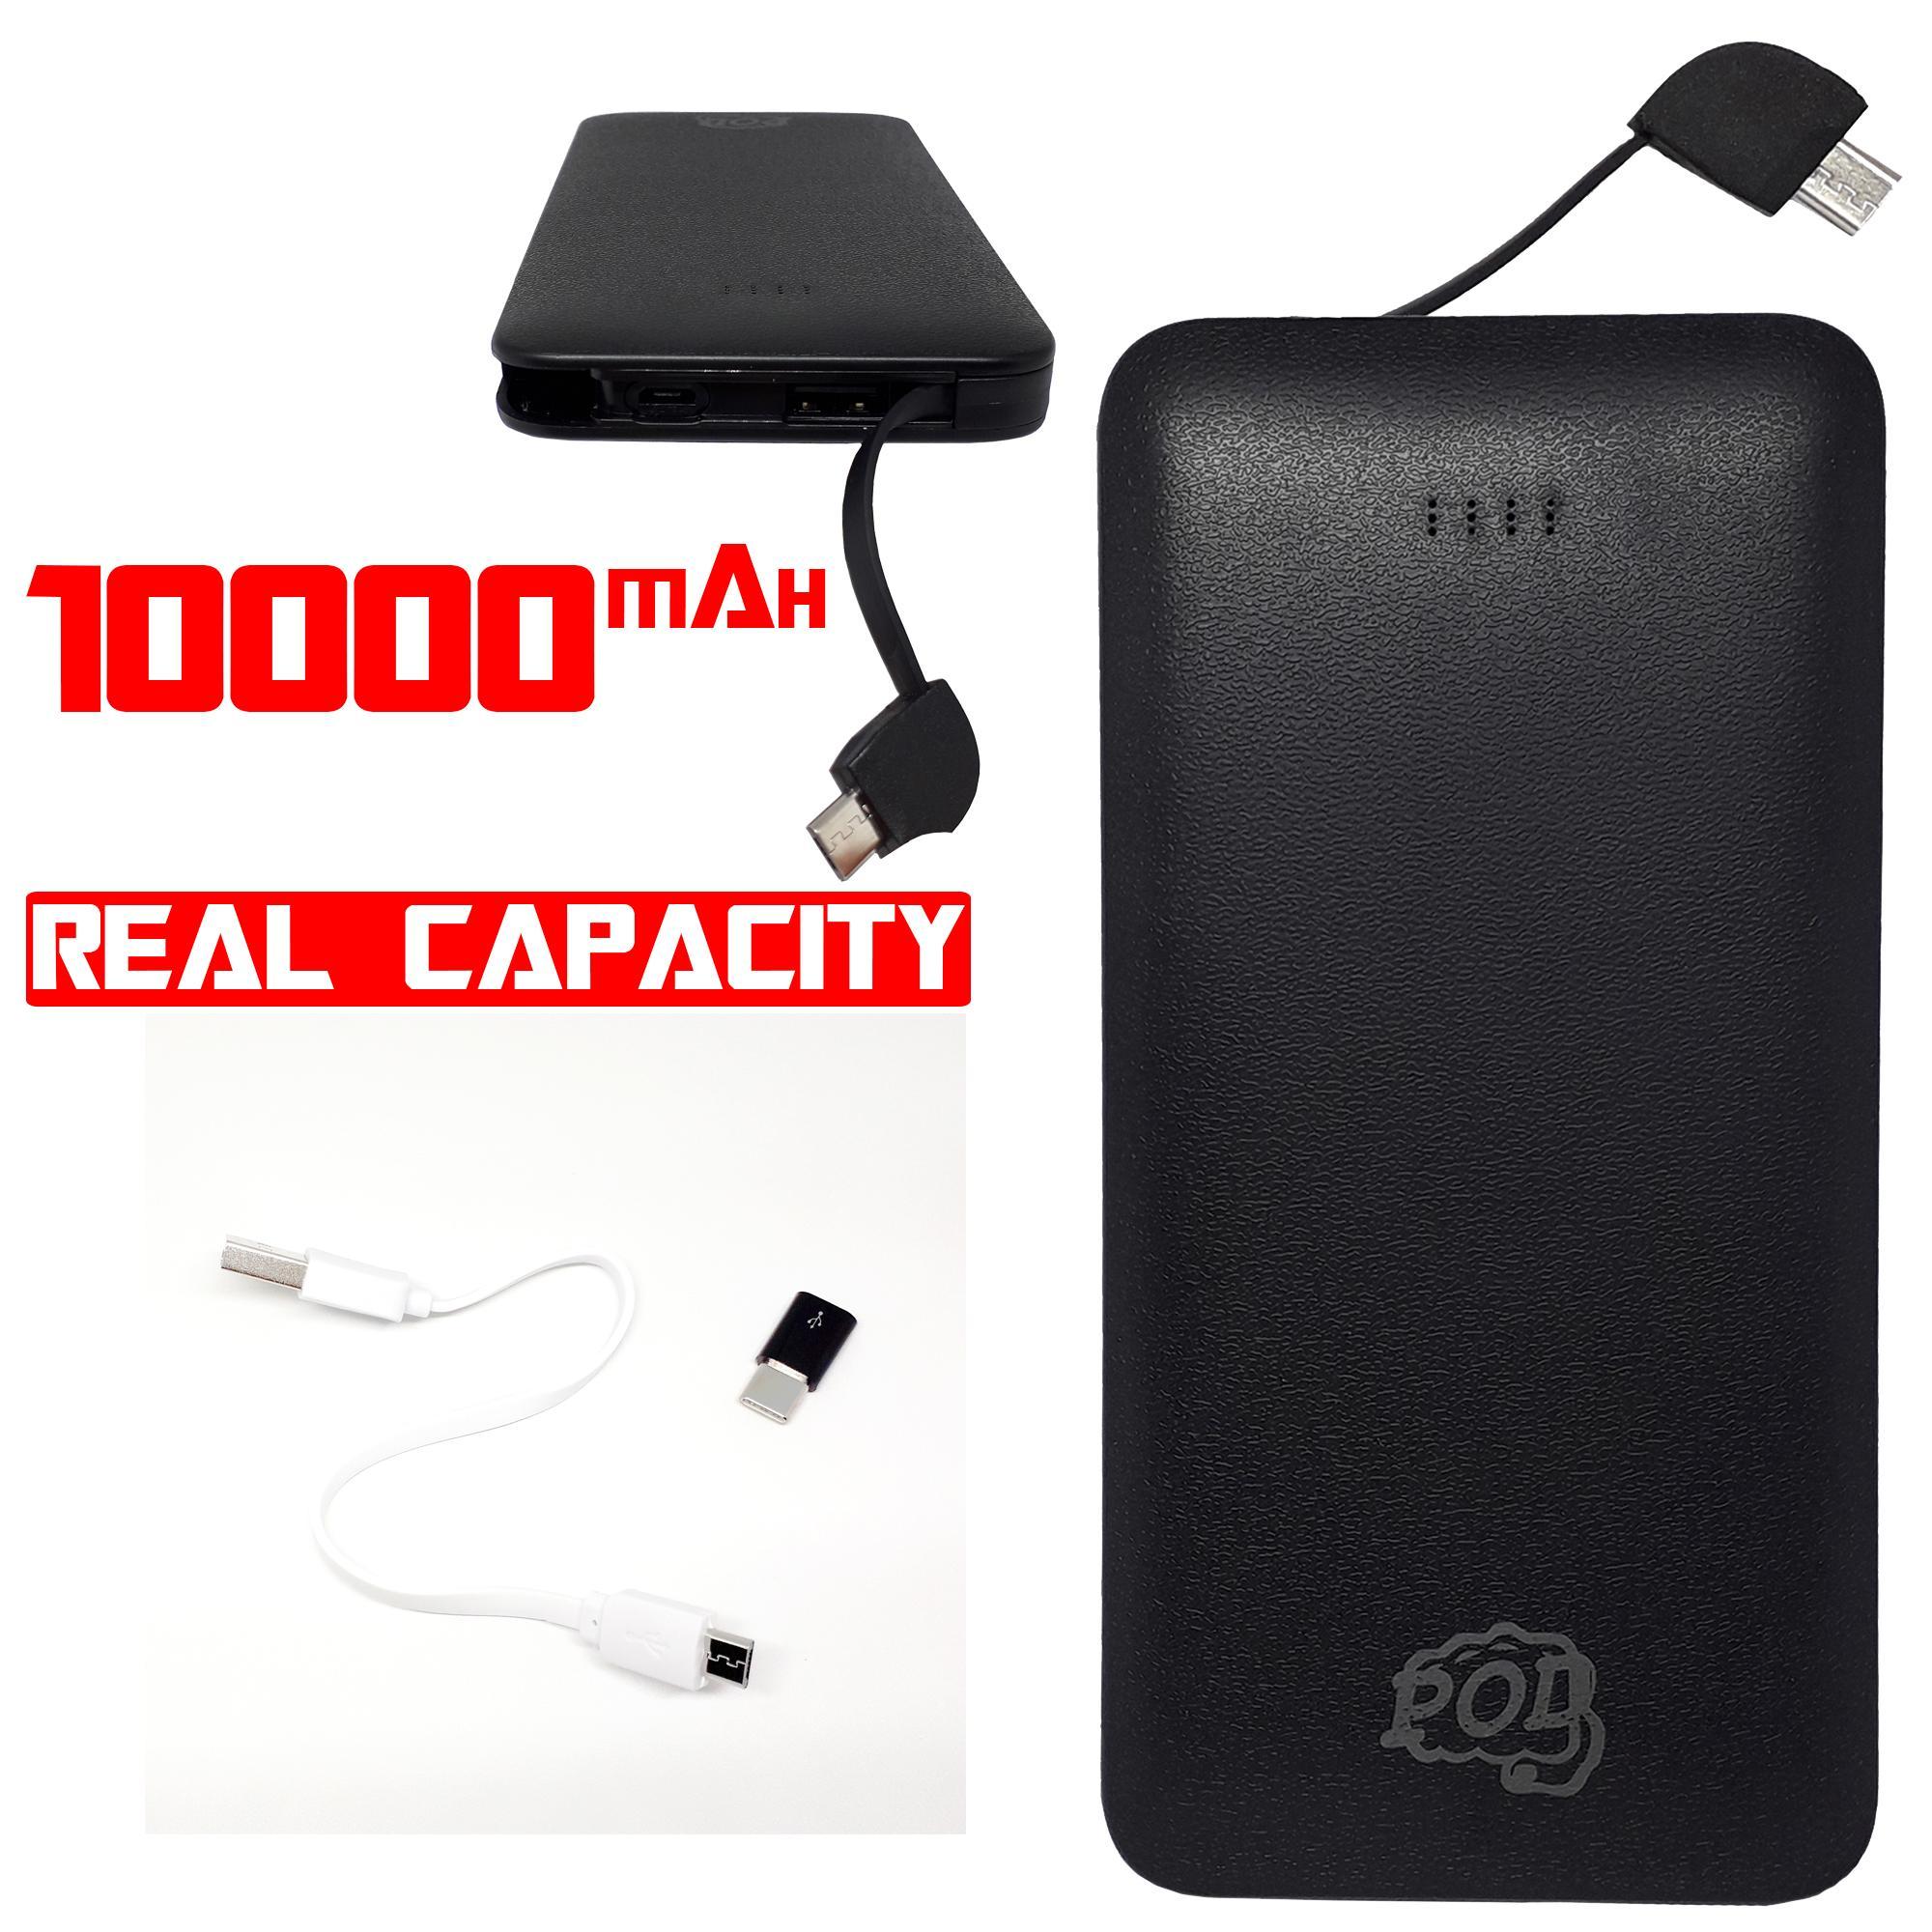 powerbank pod super slim 10.000mah original  compatibel all device – hitam